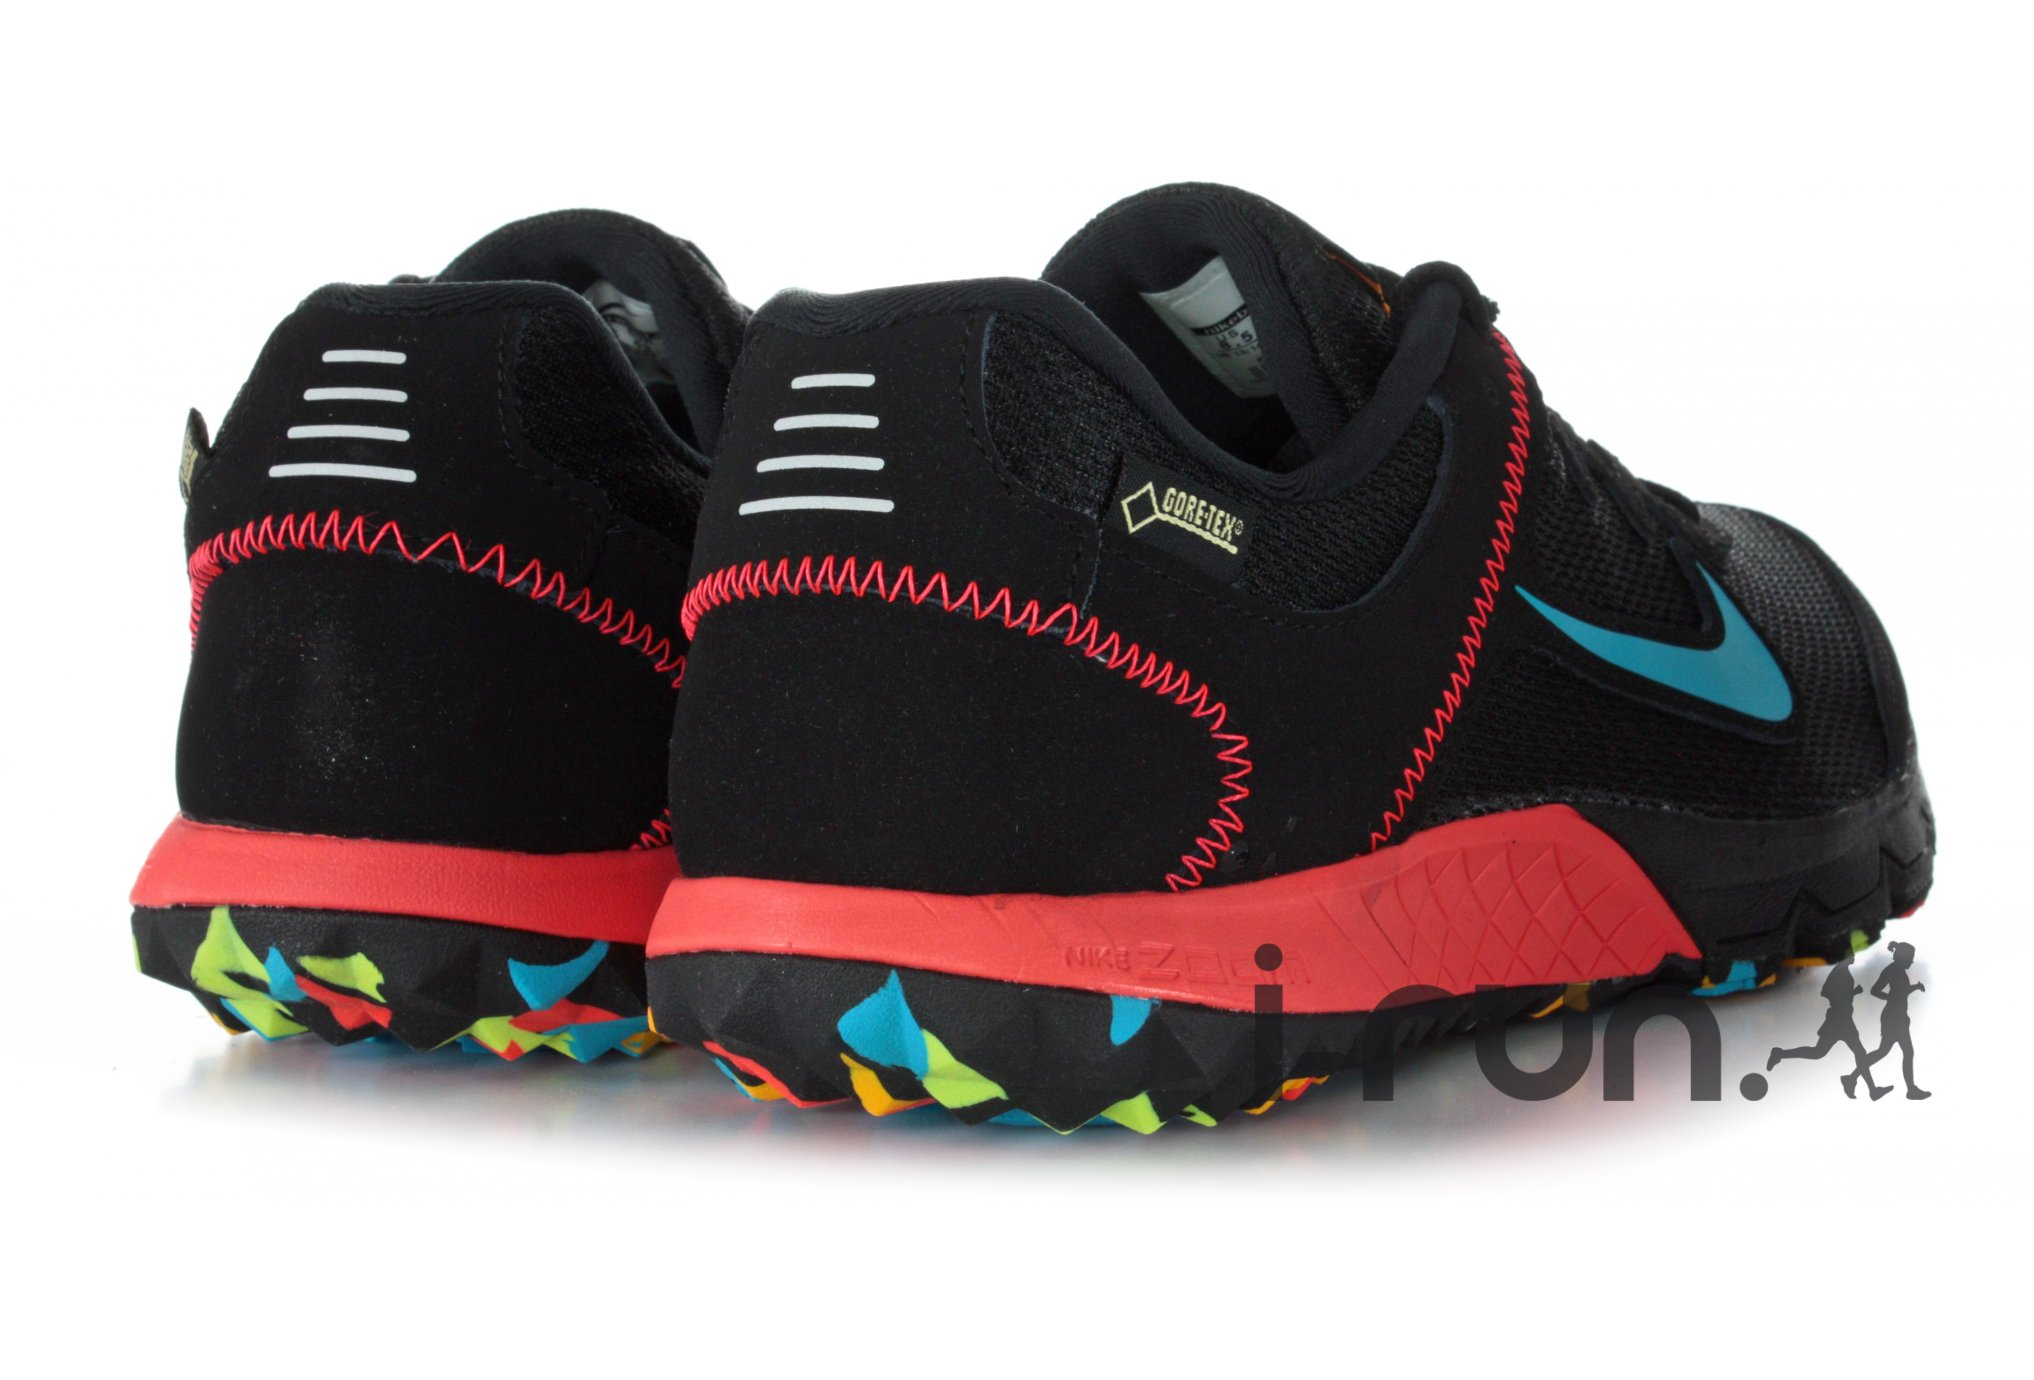 Qchxdsrt Gore Chaussure Ecologique Nike Tex qUSzVpLMG